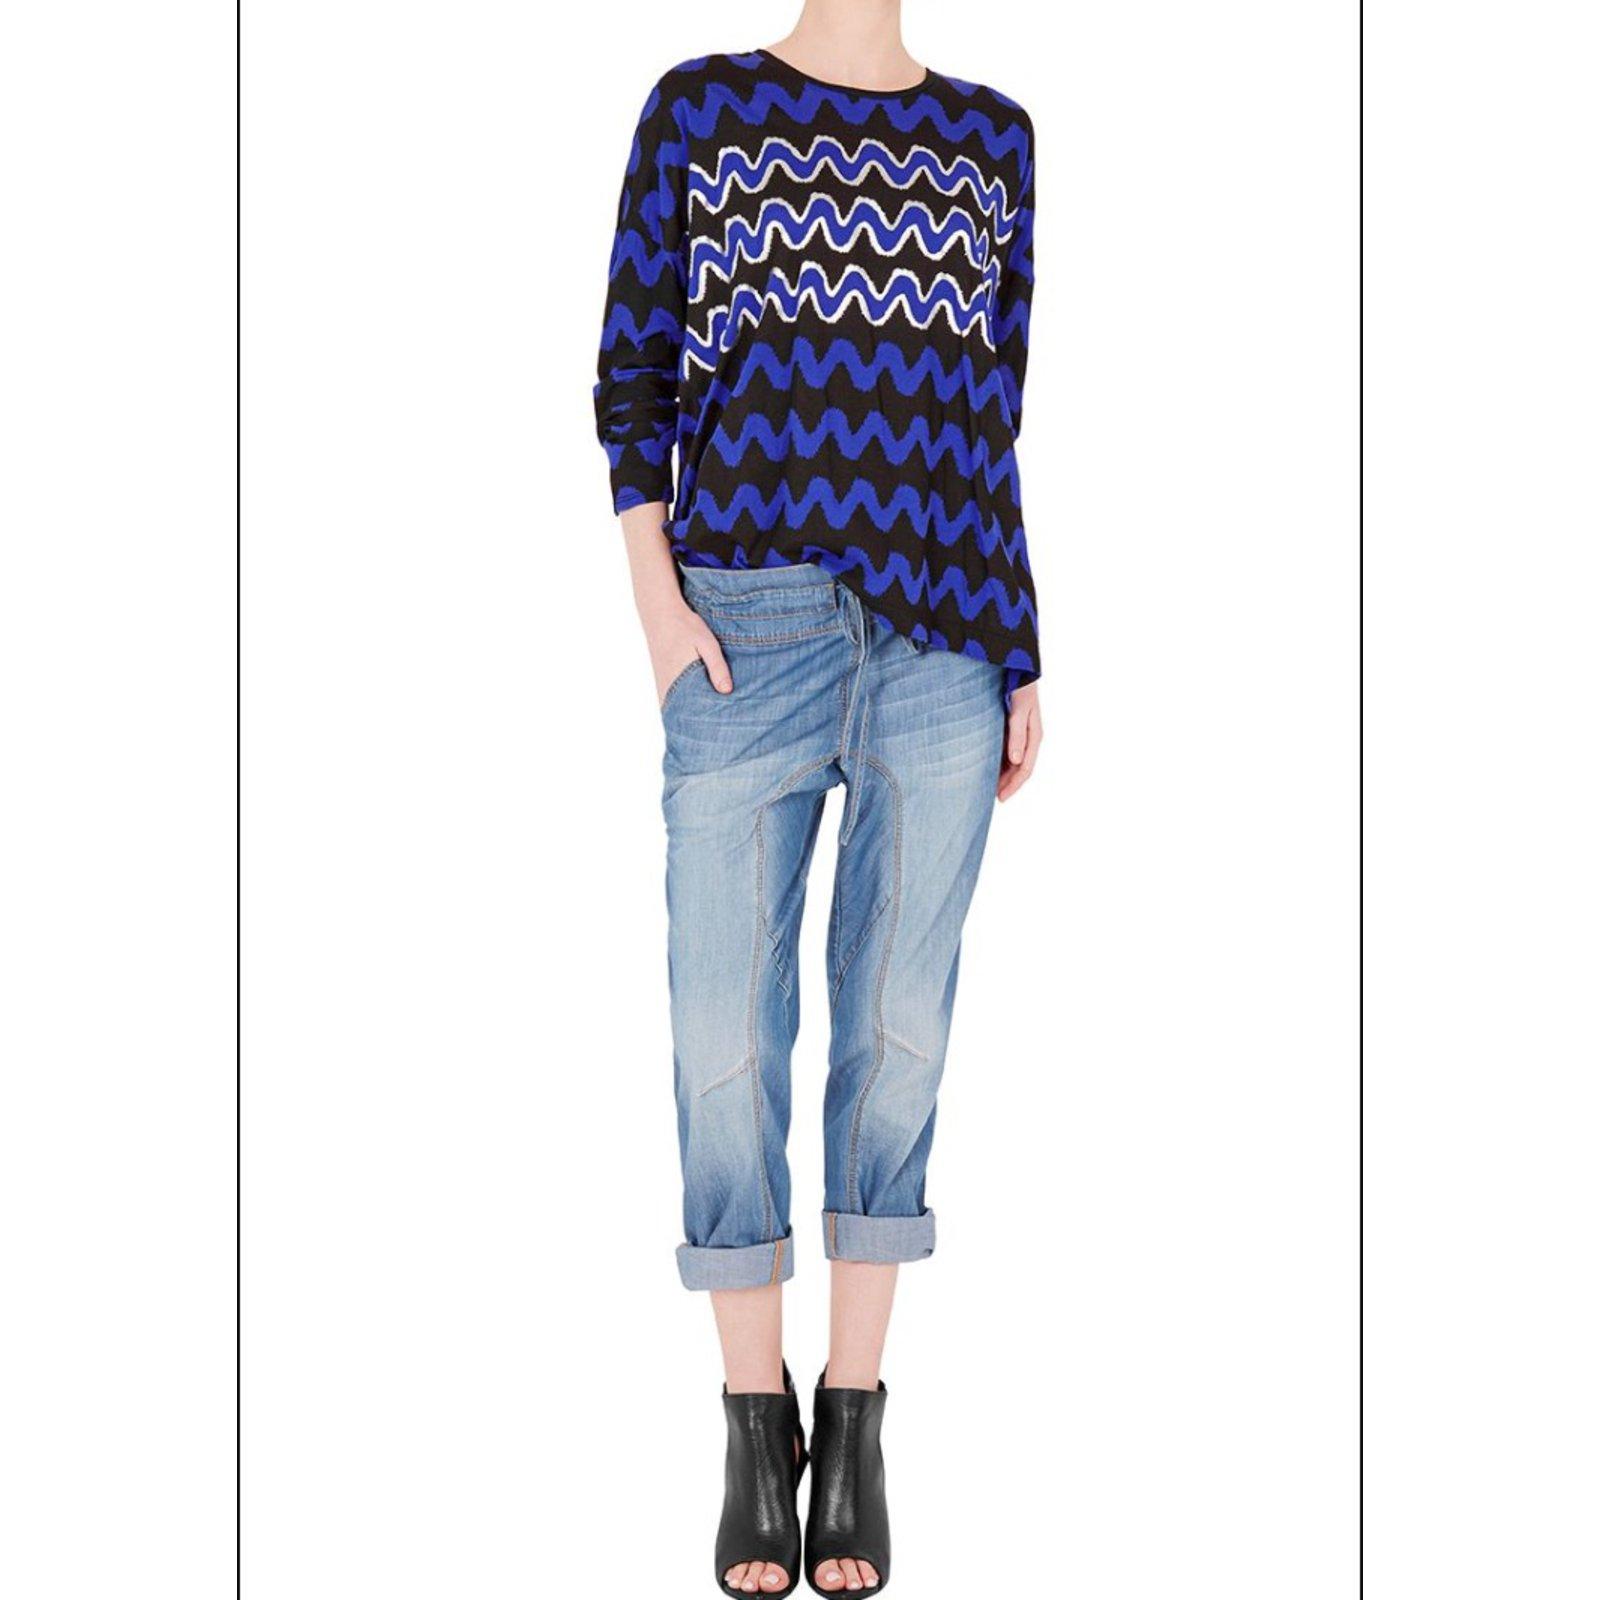 Sassamp; Coton Multicolore Tops Ref Bide Oversize 31471 Closet Top Joli AjL3RS54cq